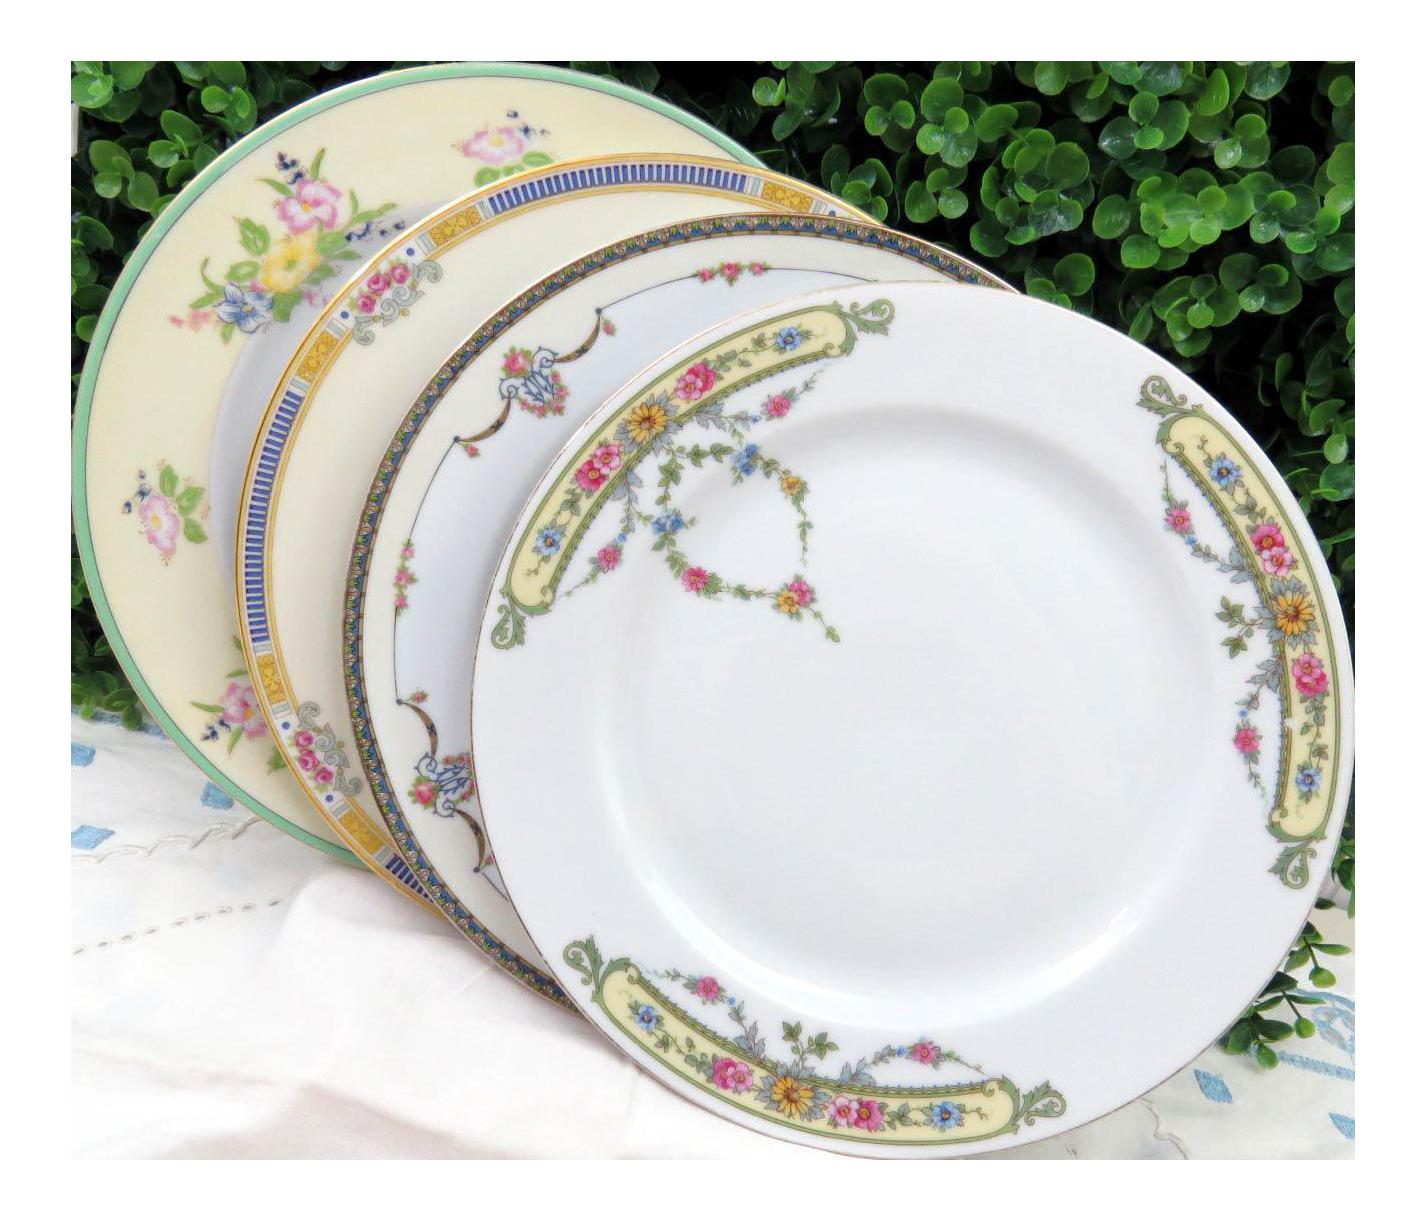 Vintage Mismatched China Dinner Plates - Set of 4  sc 1 st  Chairish & Vintage Mismatched China Dinner Plates - Set of 4 | Chairish